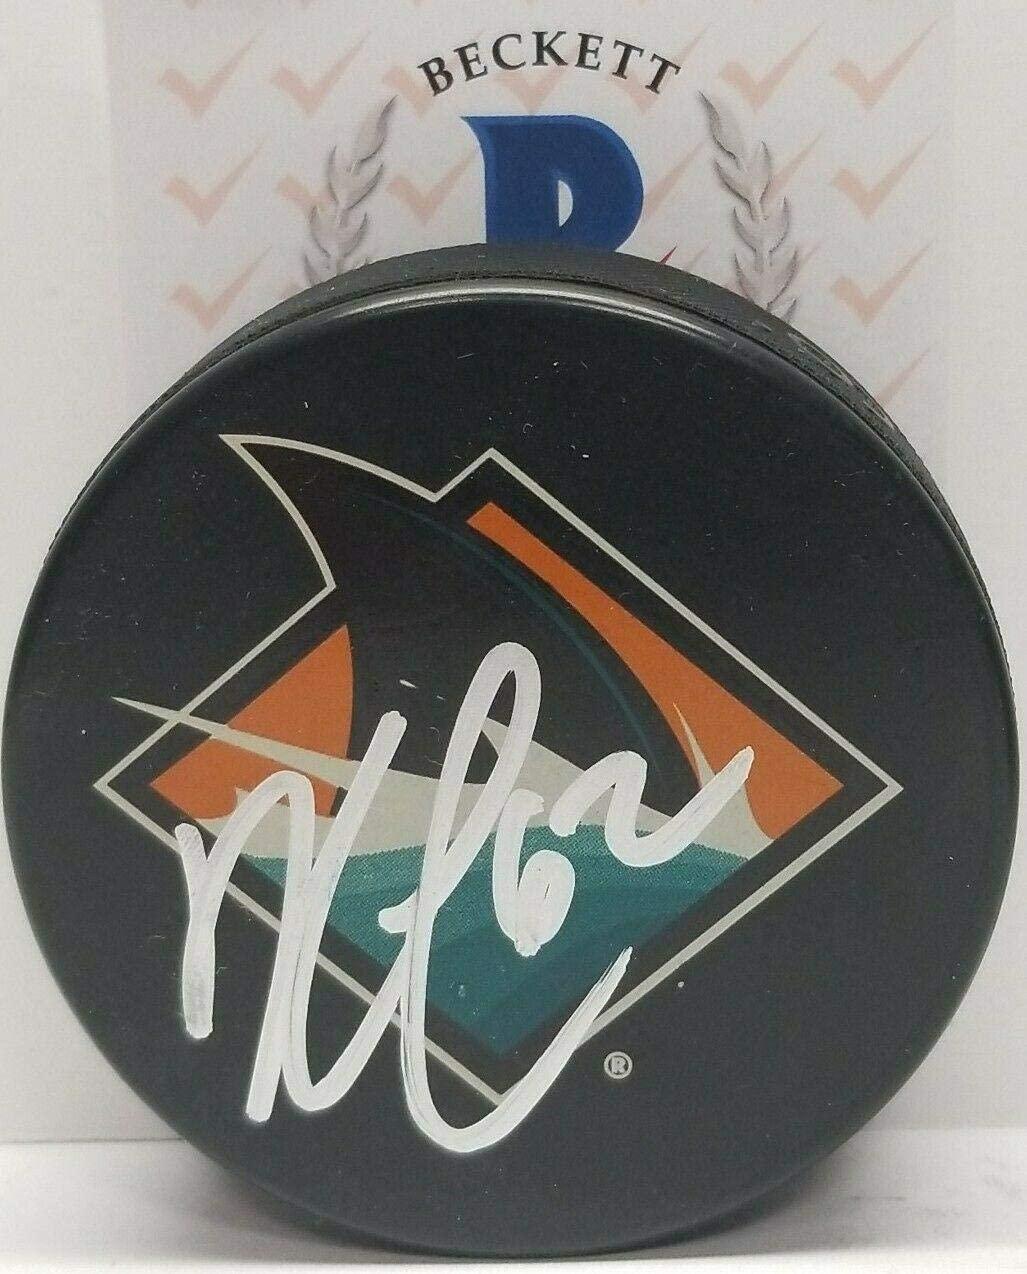 Kevin Labanc Autographed Hockey Puck - BECKETT - Beckett Authentication - Autographed NHL Pucks